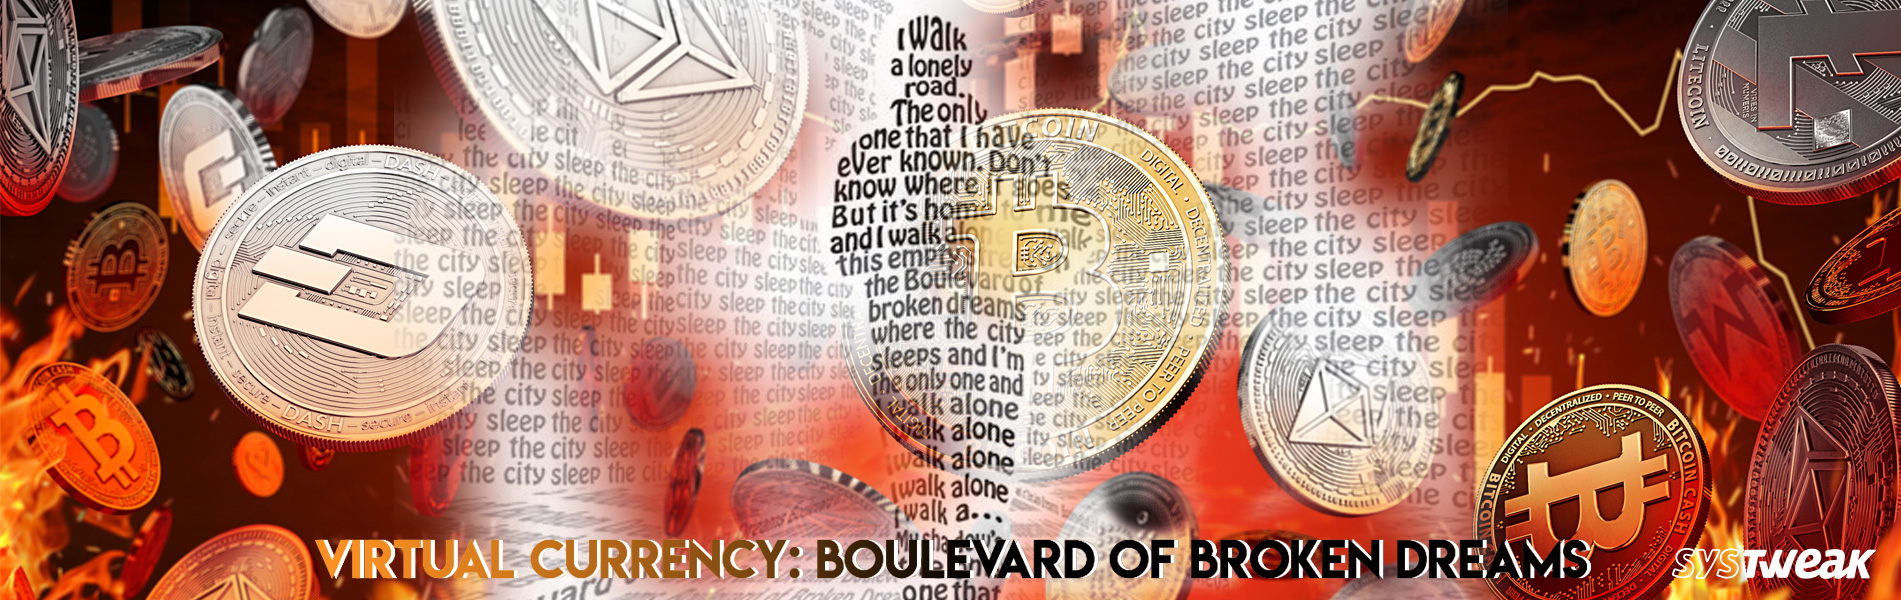 Virtual Currency: Boulevard of Broken Dreams